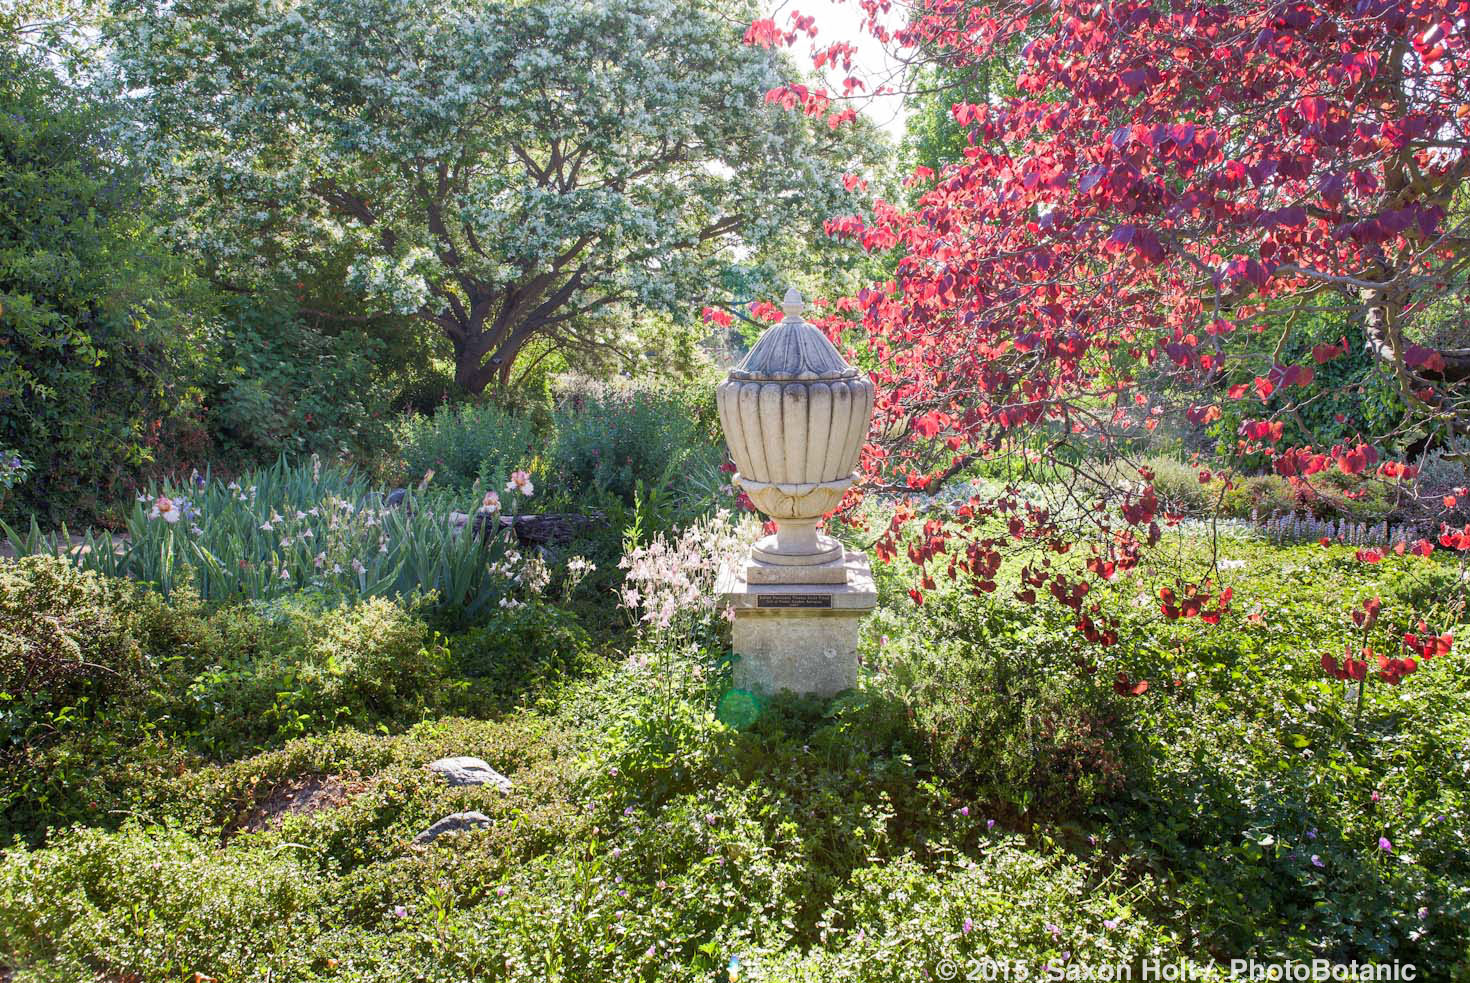 Los Angeles County Arboretum And Botanic Garden Los Angeles Arboretum Engagement Josh And